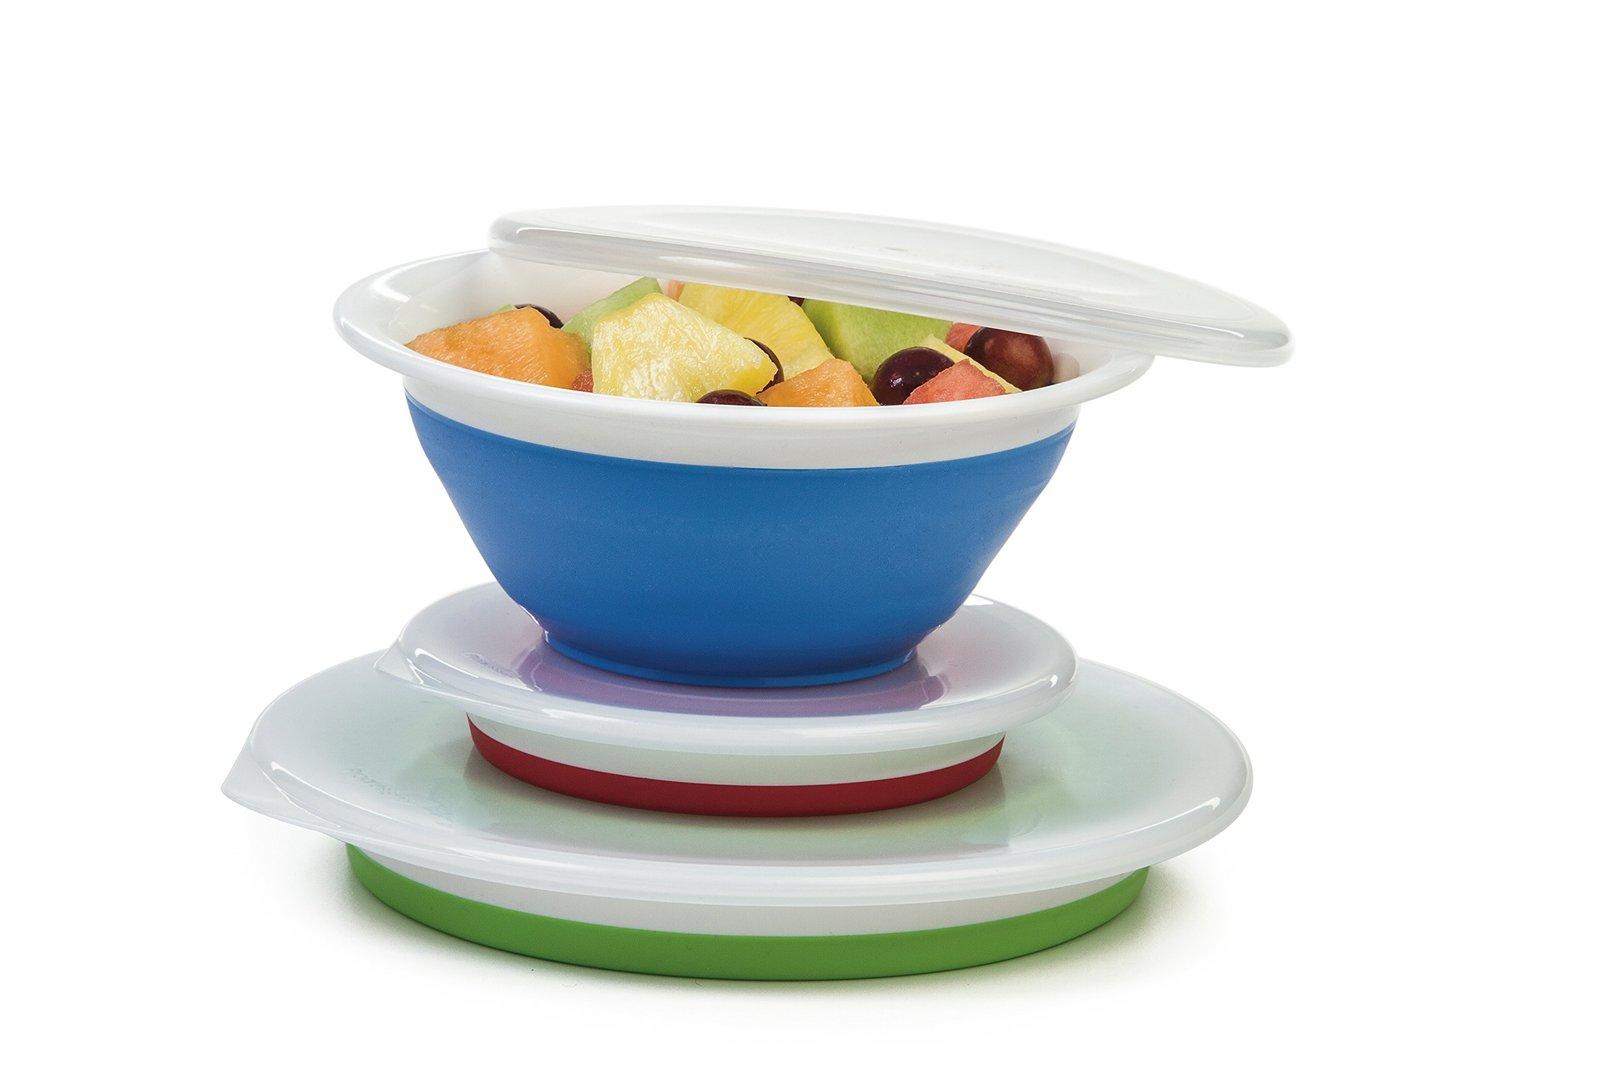 Progressive Prepworks Thinstore Collapsible Prep/Storage Bowls with Lids - Set o